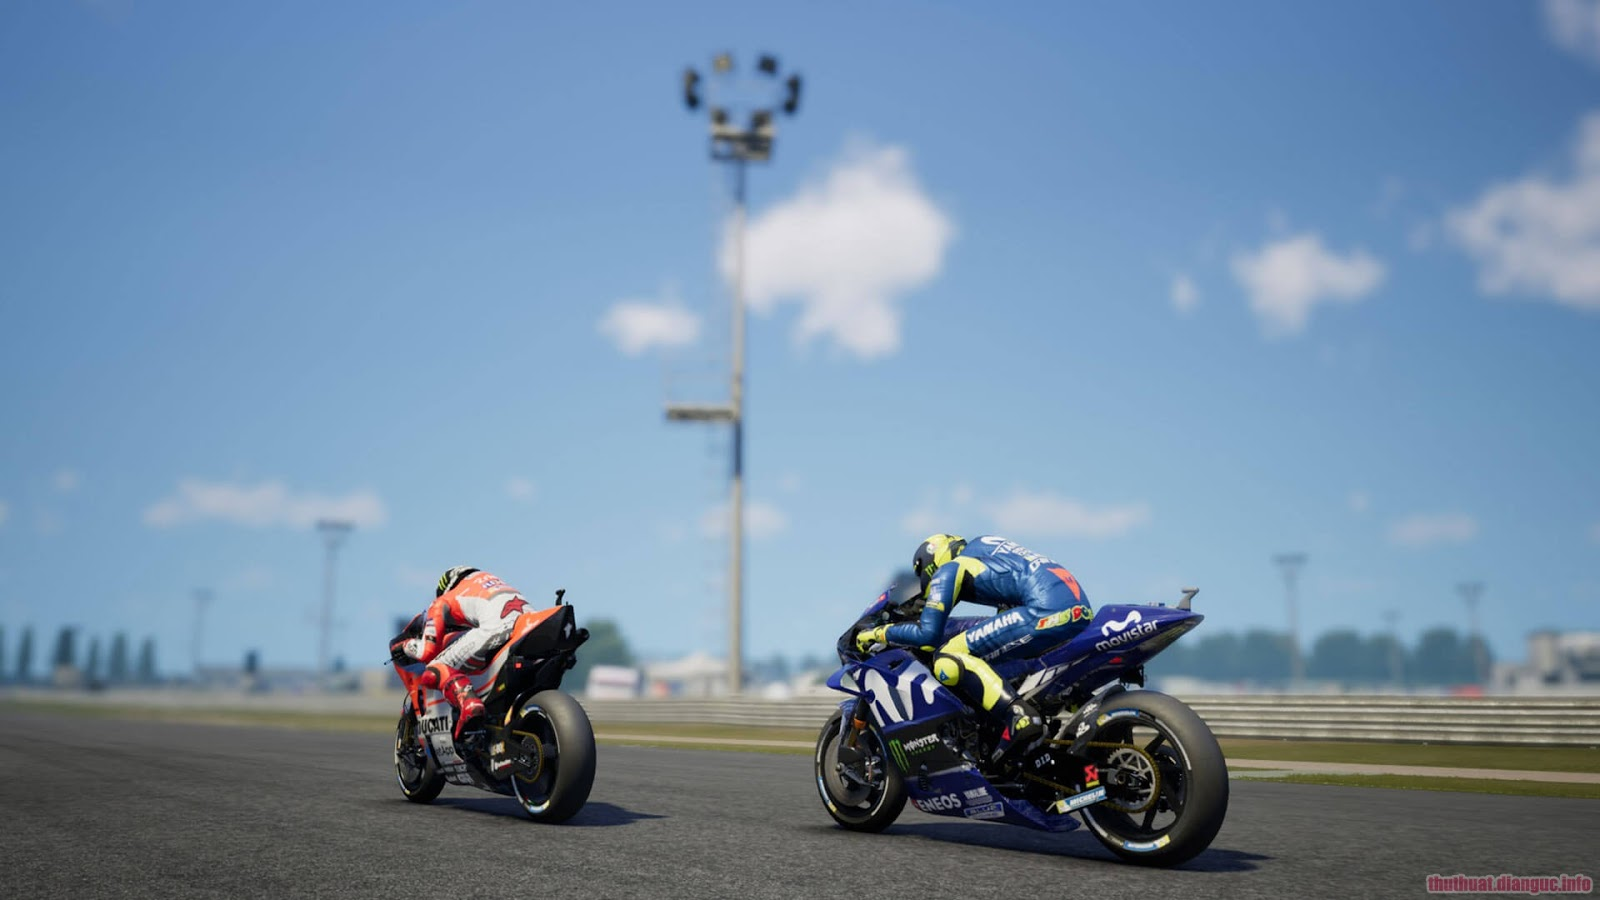 Download Game MotoGP 18 Full Crack, Game MotoGP 18, Game MotoGP 18 FREE DOWNLOAD, MotoGP 18, MotoGP 18 free download